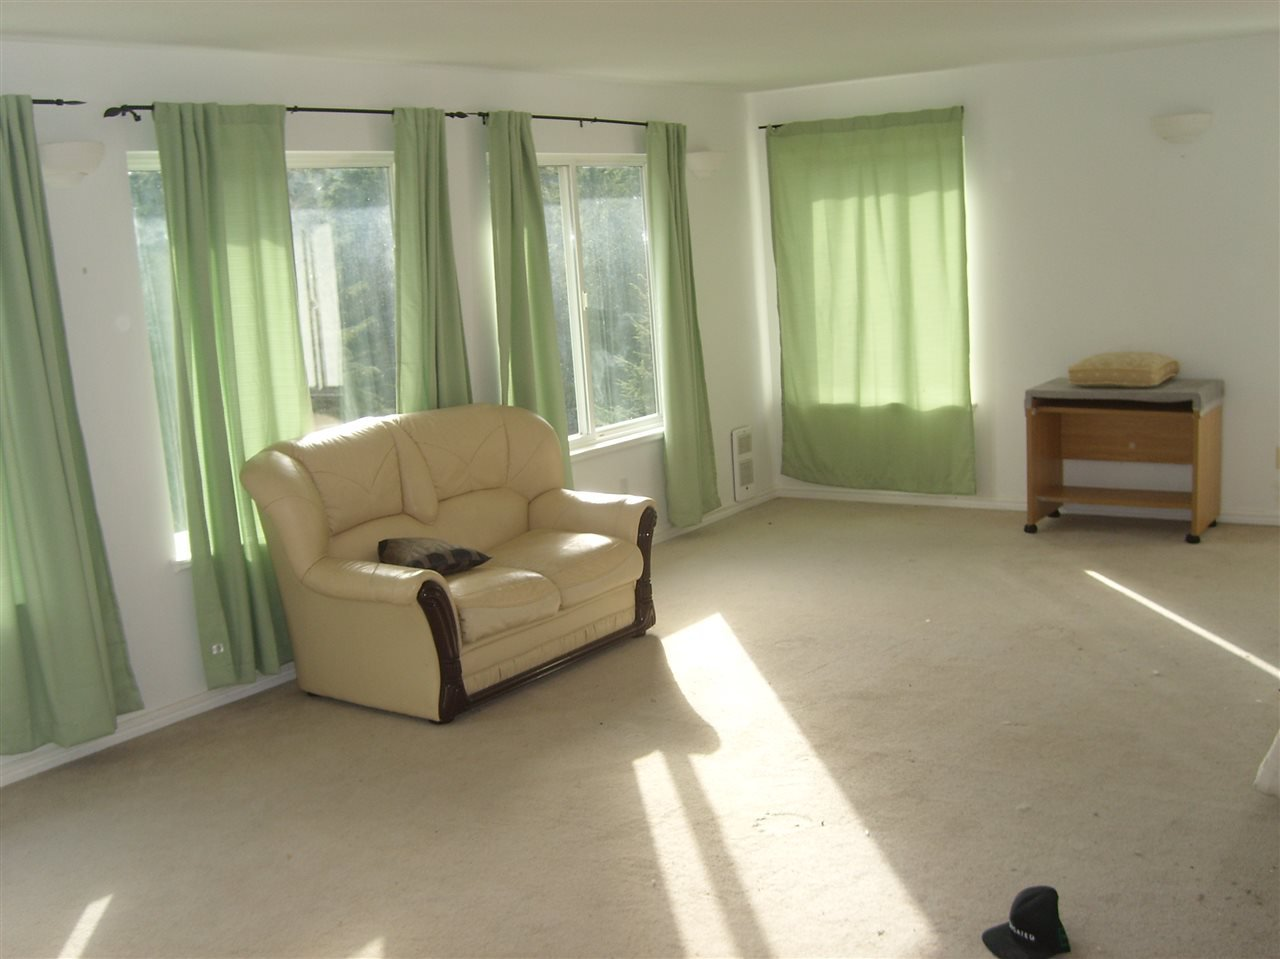 Photo 9: Photos: 28640 123 Avenue in Maple Ridge: Northeast House for sale : MLS®# R2419989